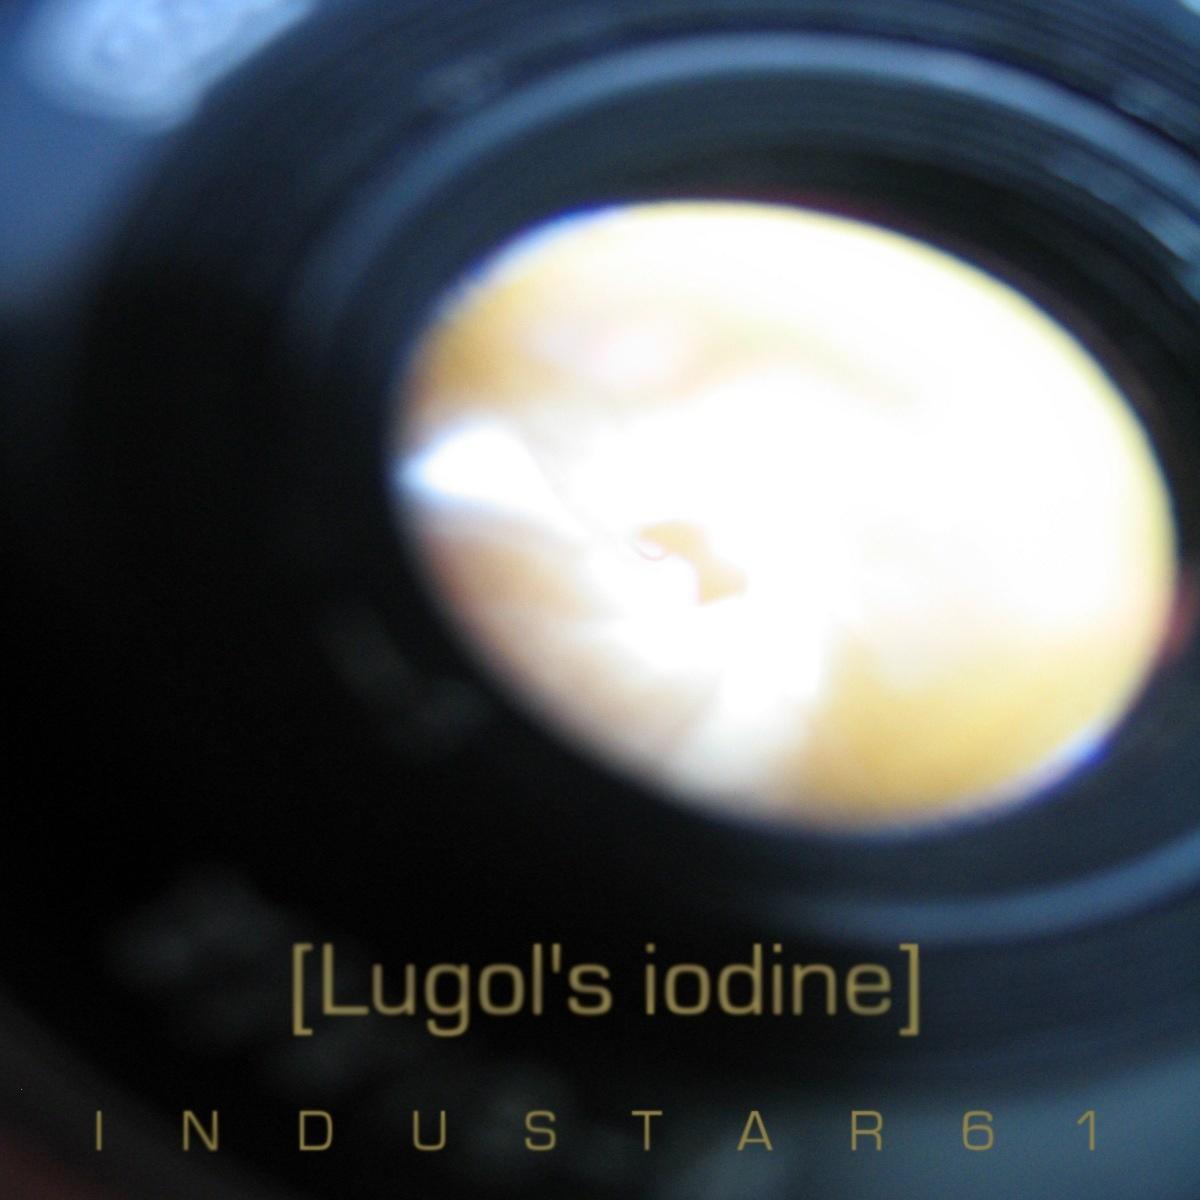 lugolsiodine_industar61